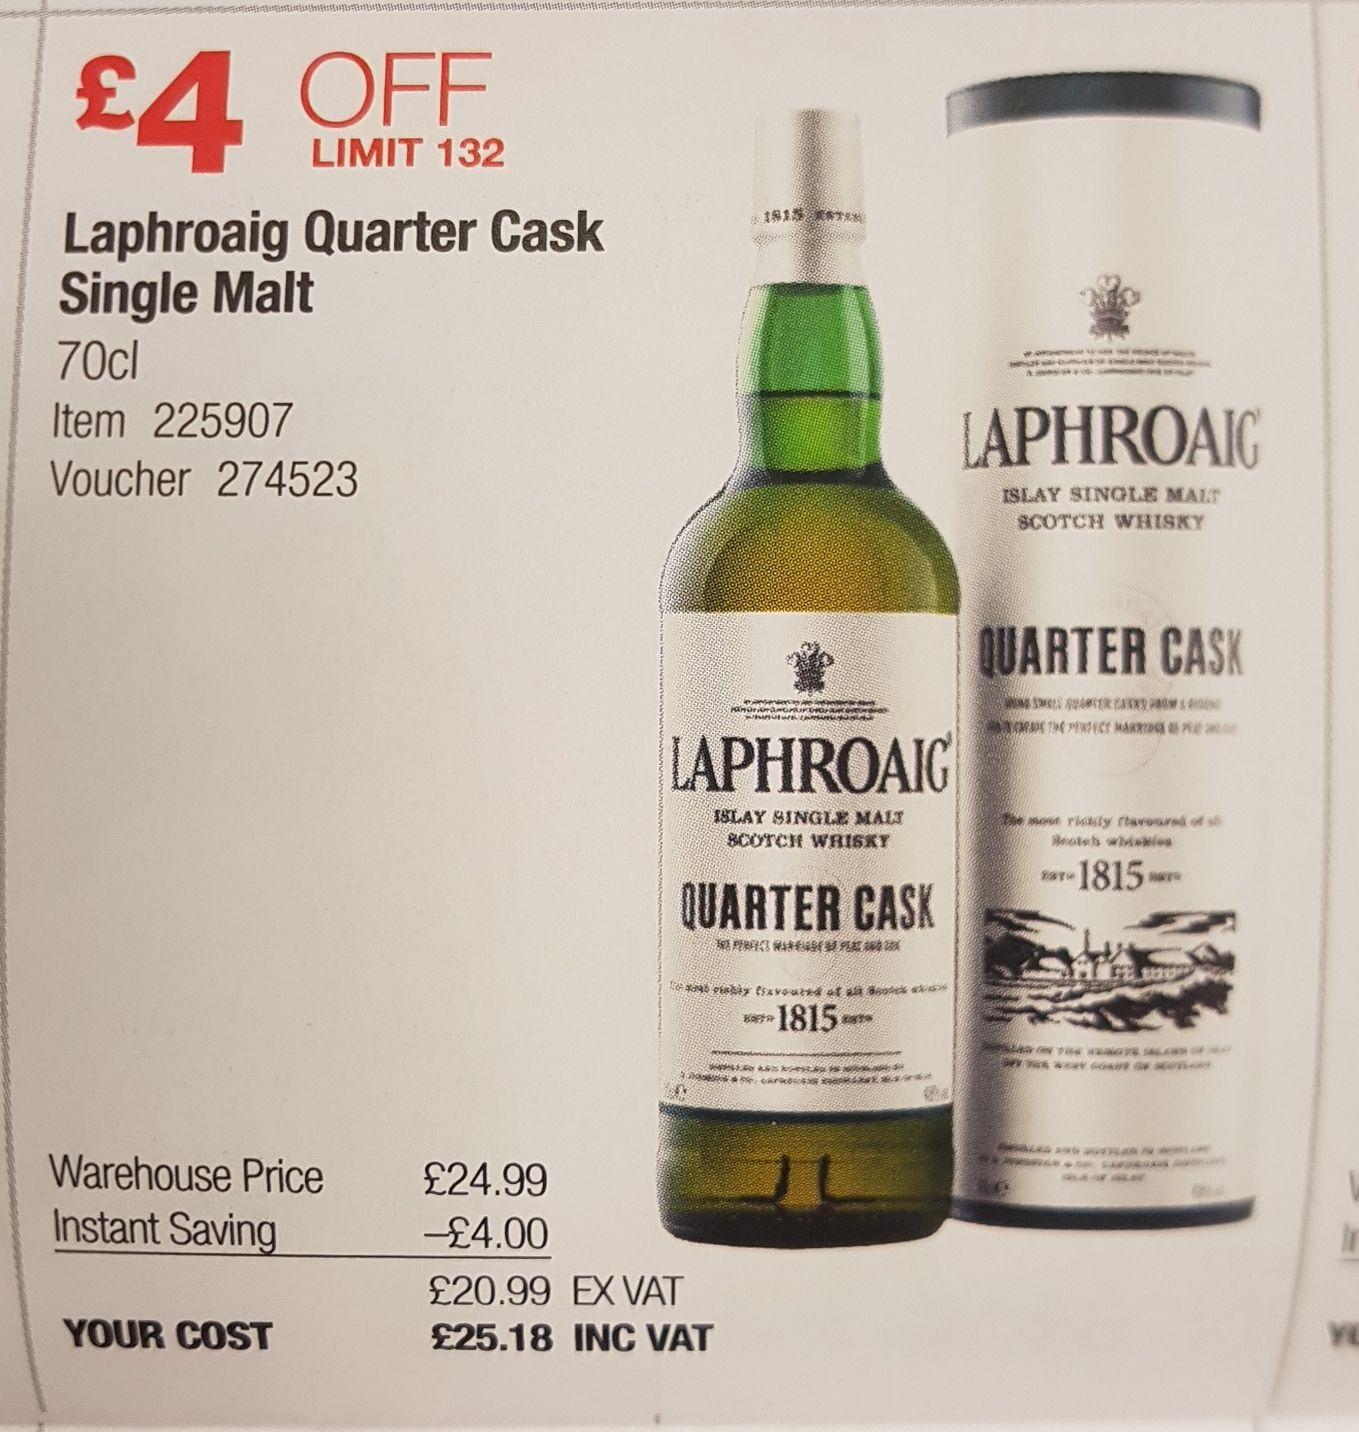 Laphroaig Quarter Cask Single Malt Scotch Whisky 70cl 48% £25.18 @ Costco